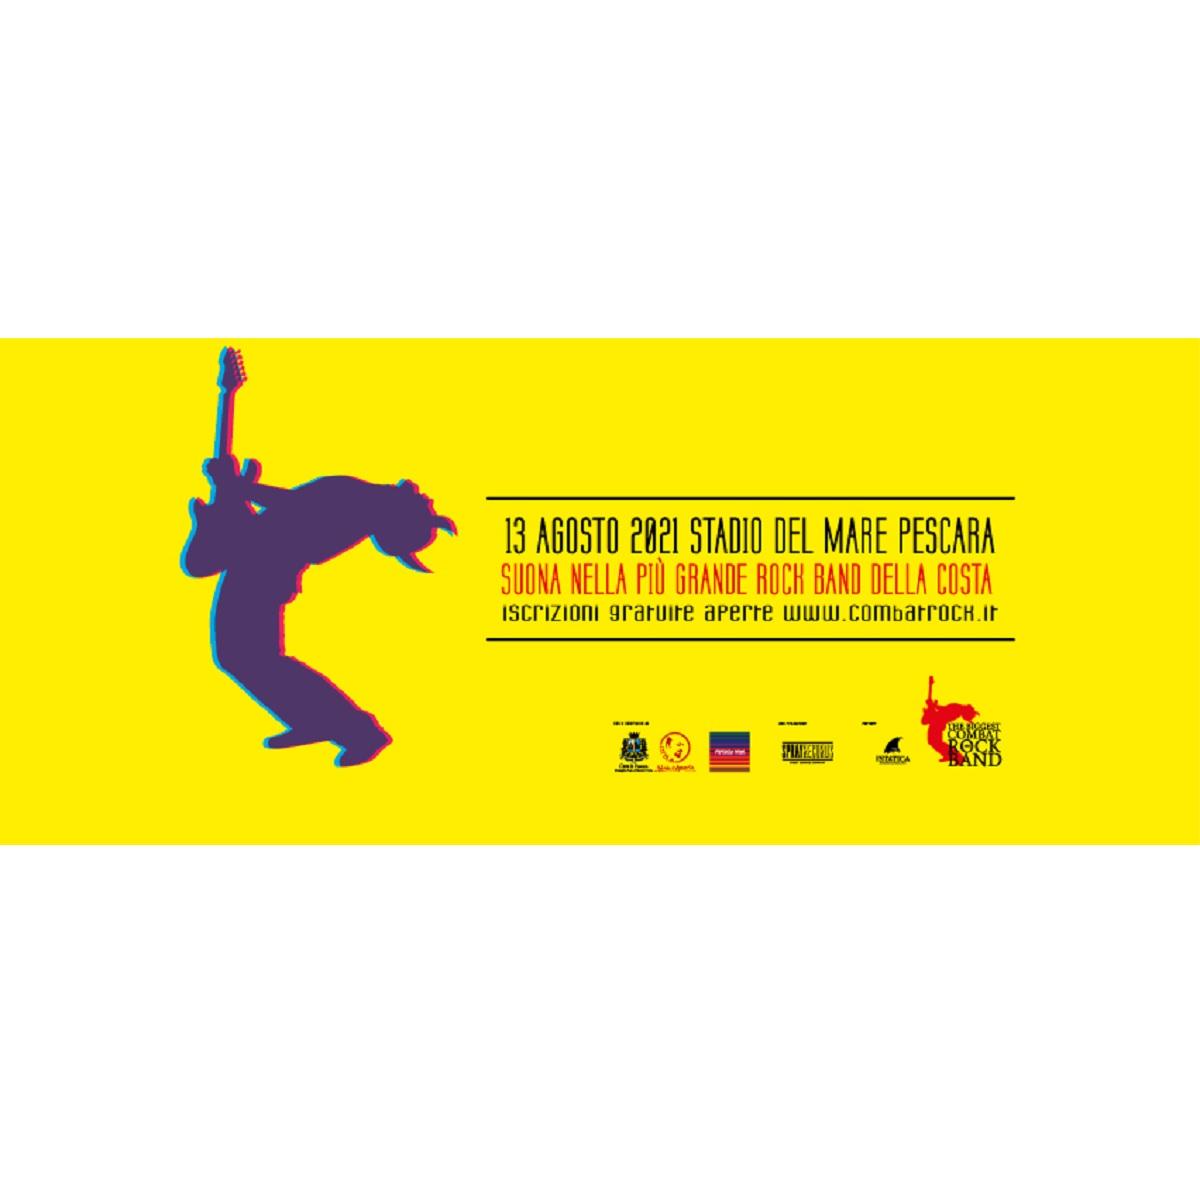 Combat Rock a Pescara presso lo Stadio del Mare foto